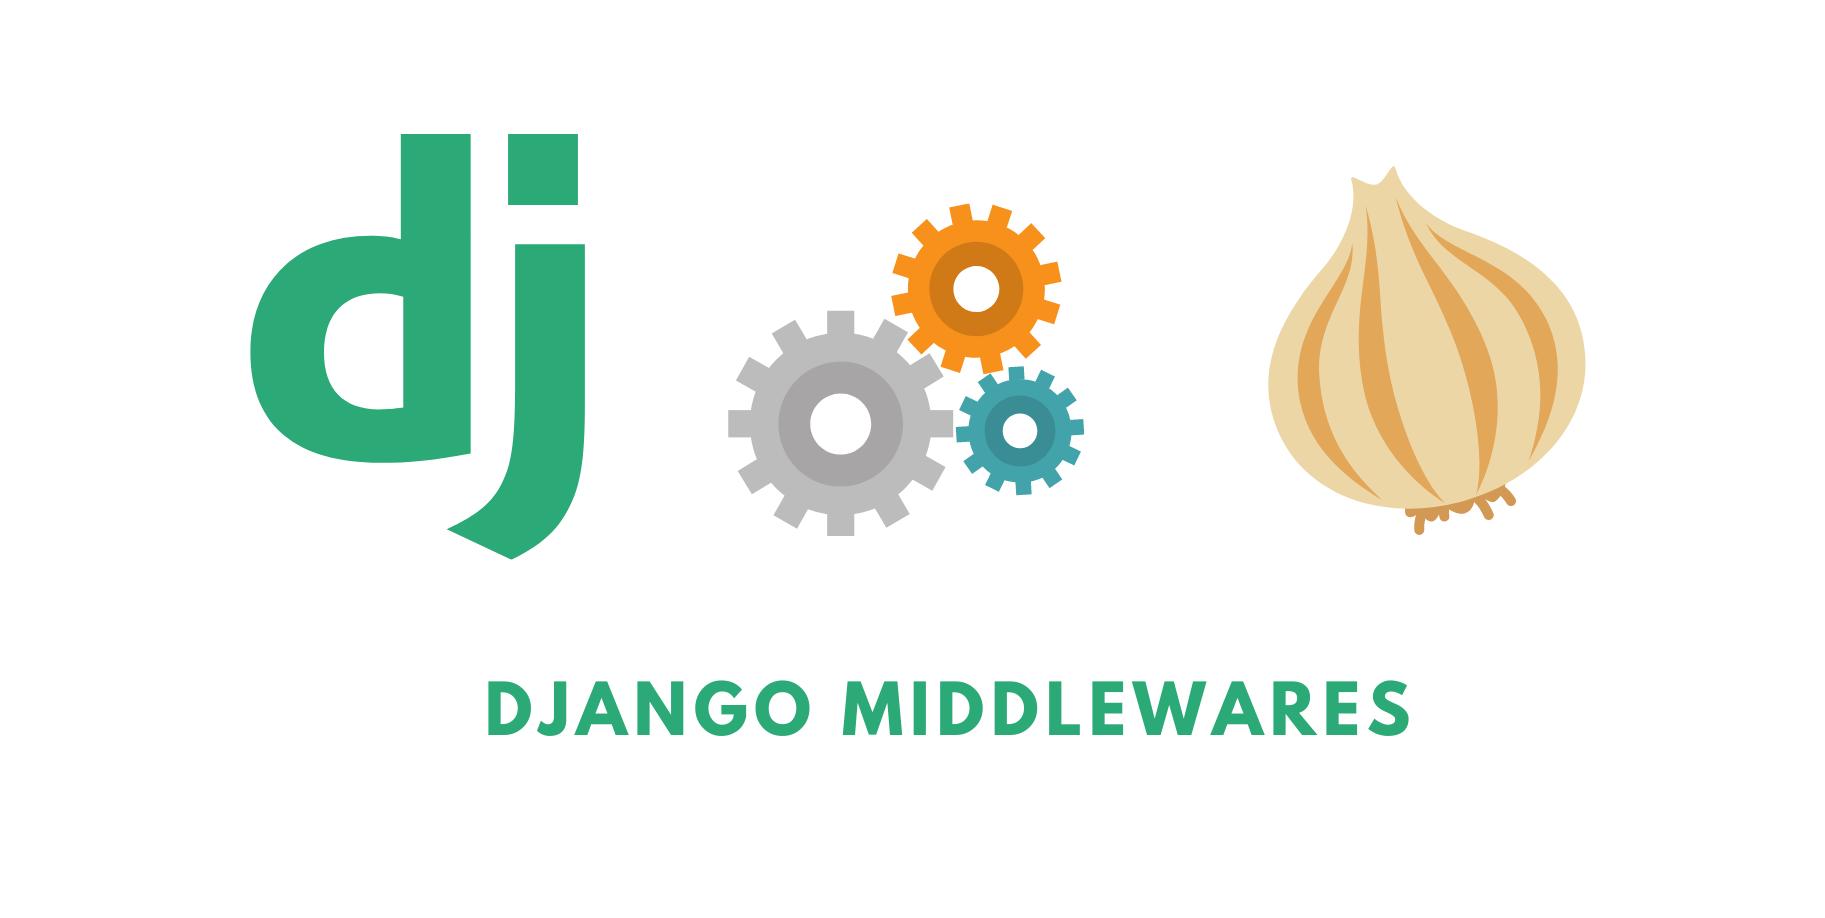 django-middleware-blog-post-header